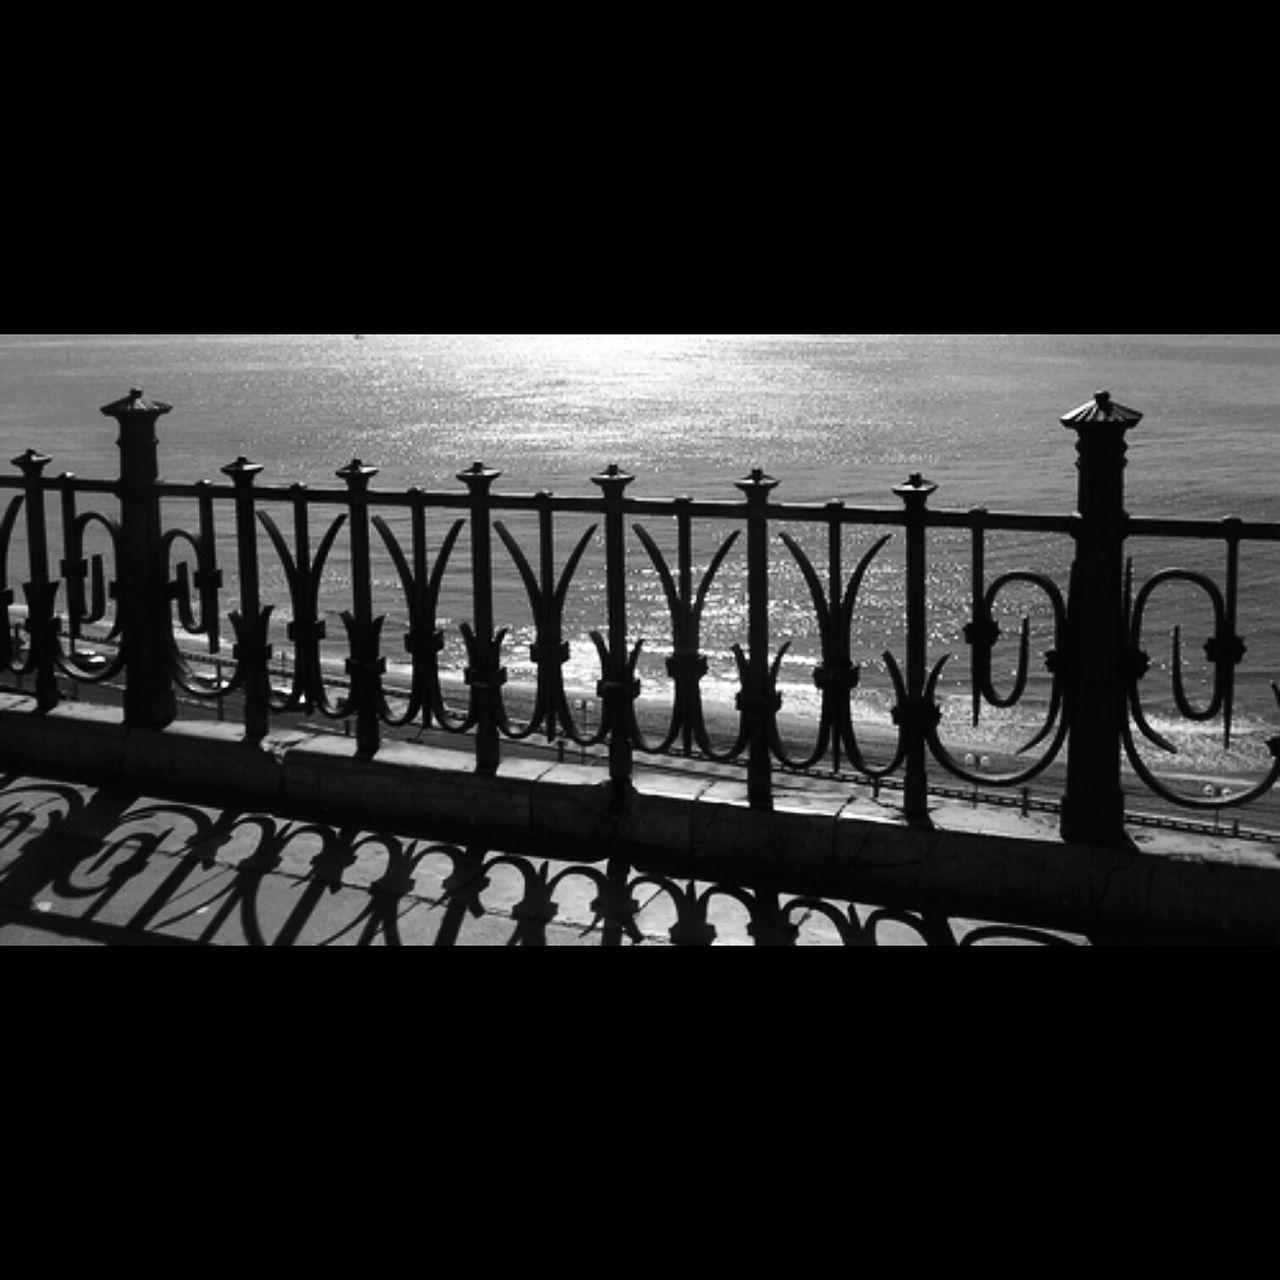 Tarragona Tarraco  Tarraco Viva Outdoors Somosfelices Catalunyagrafias Eyeemphotography Balcondelmediterraneo Catalunya Catalunyaexperience Luz E Sombra EyeEm Best Shots - Black + White Blanco Y Negro Eye4black&white  Blancoynegro Black And White Photography Eye4black&white  Negro Blackandwhitephotography MonochromePhotography Fortheloveofblackandwhite Barcelona Silhouette Blackandwhite Photography Home Acasa